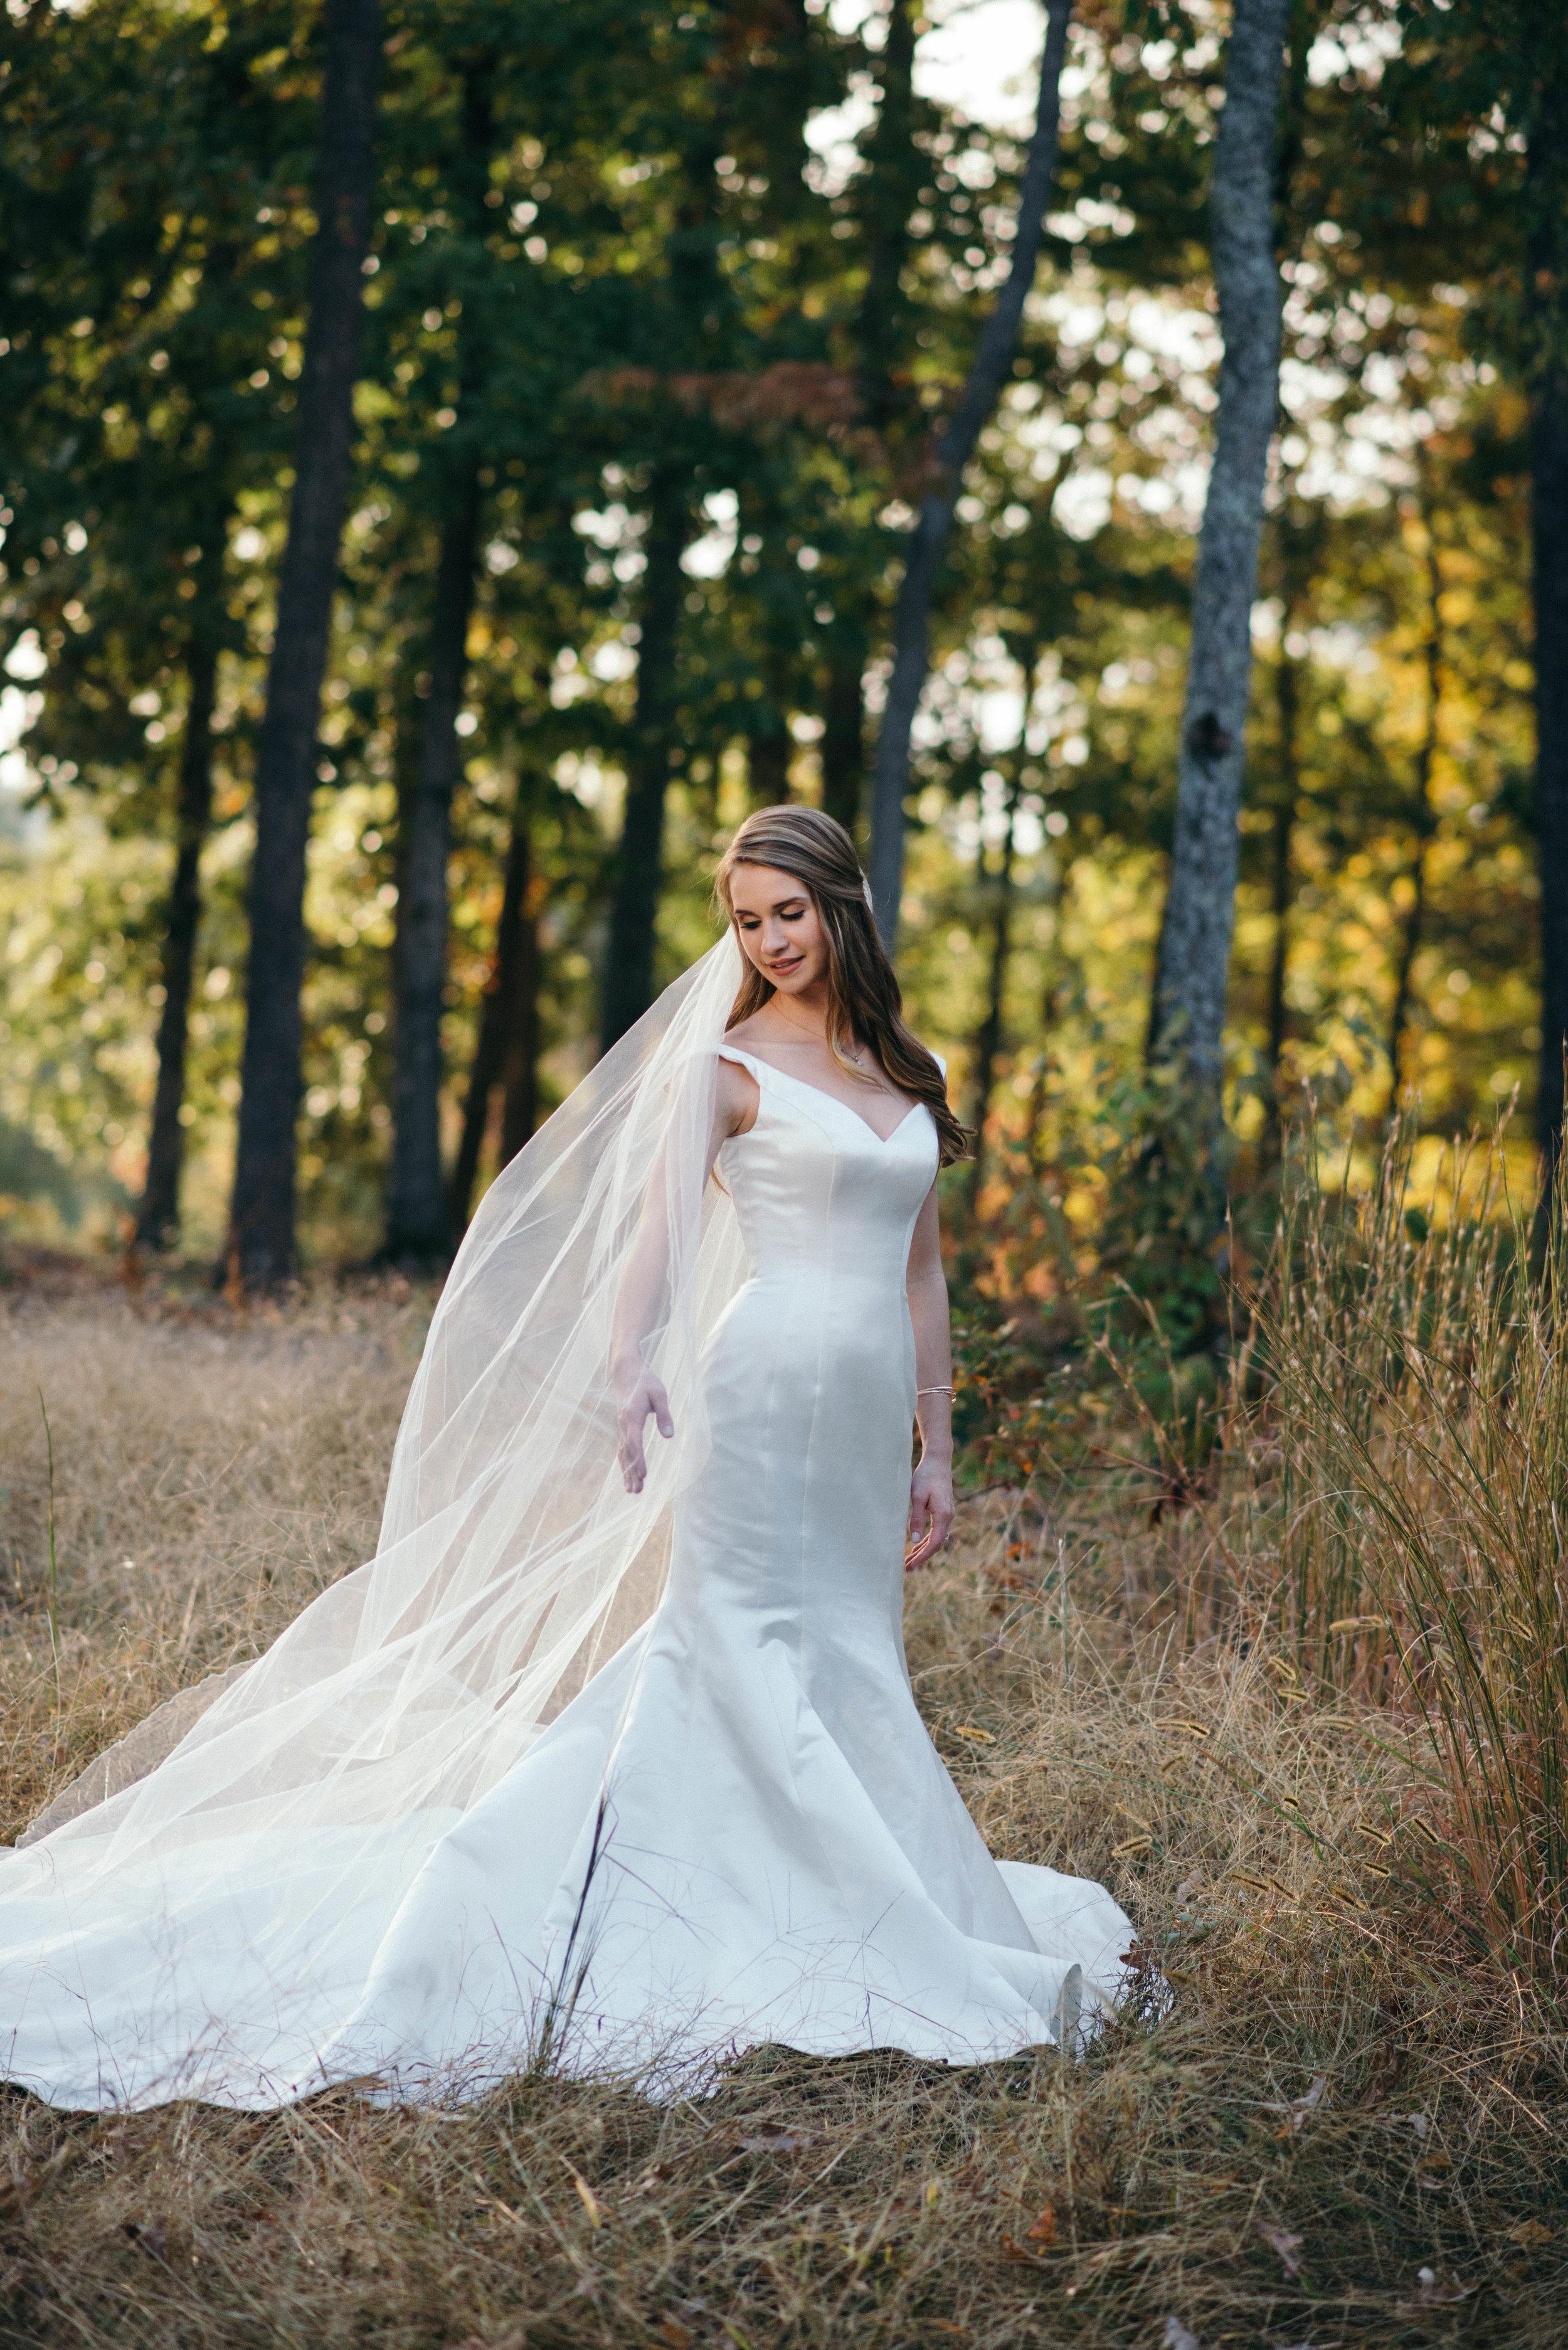 JuliaWilliams|Bridals|Color_MiraPhotographs-68.jpg